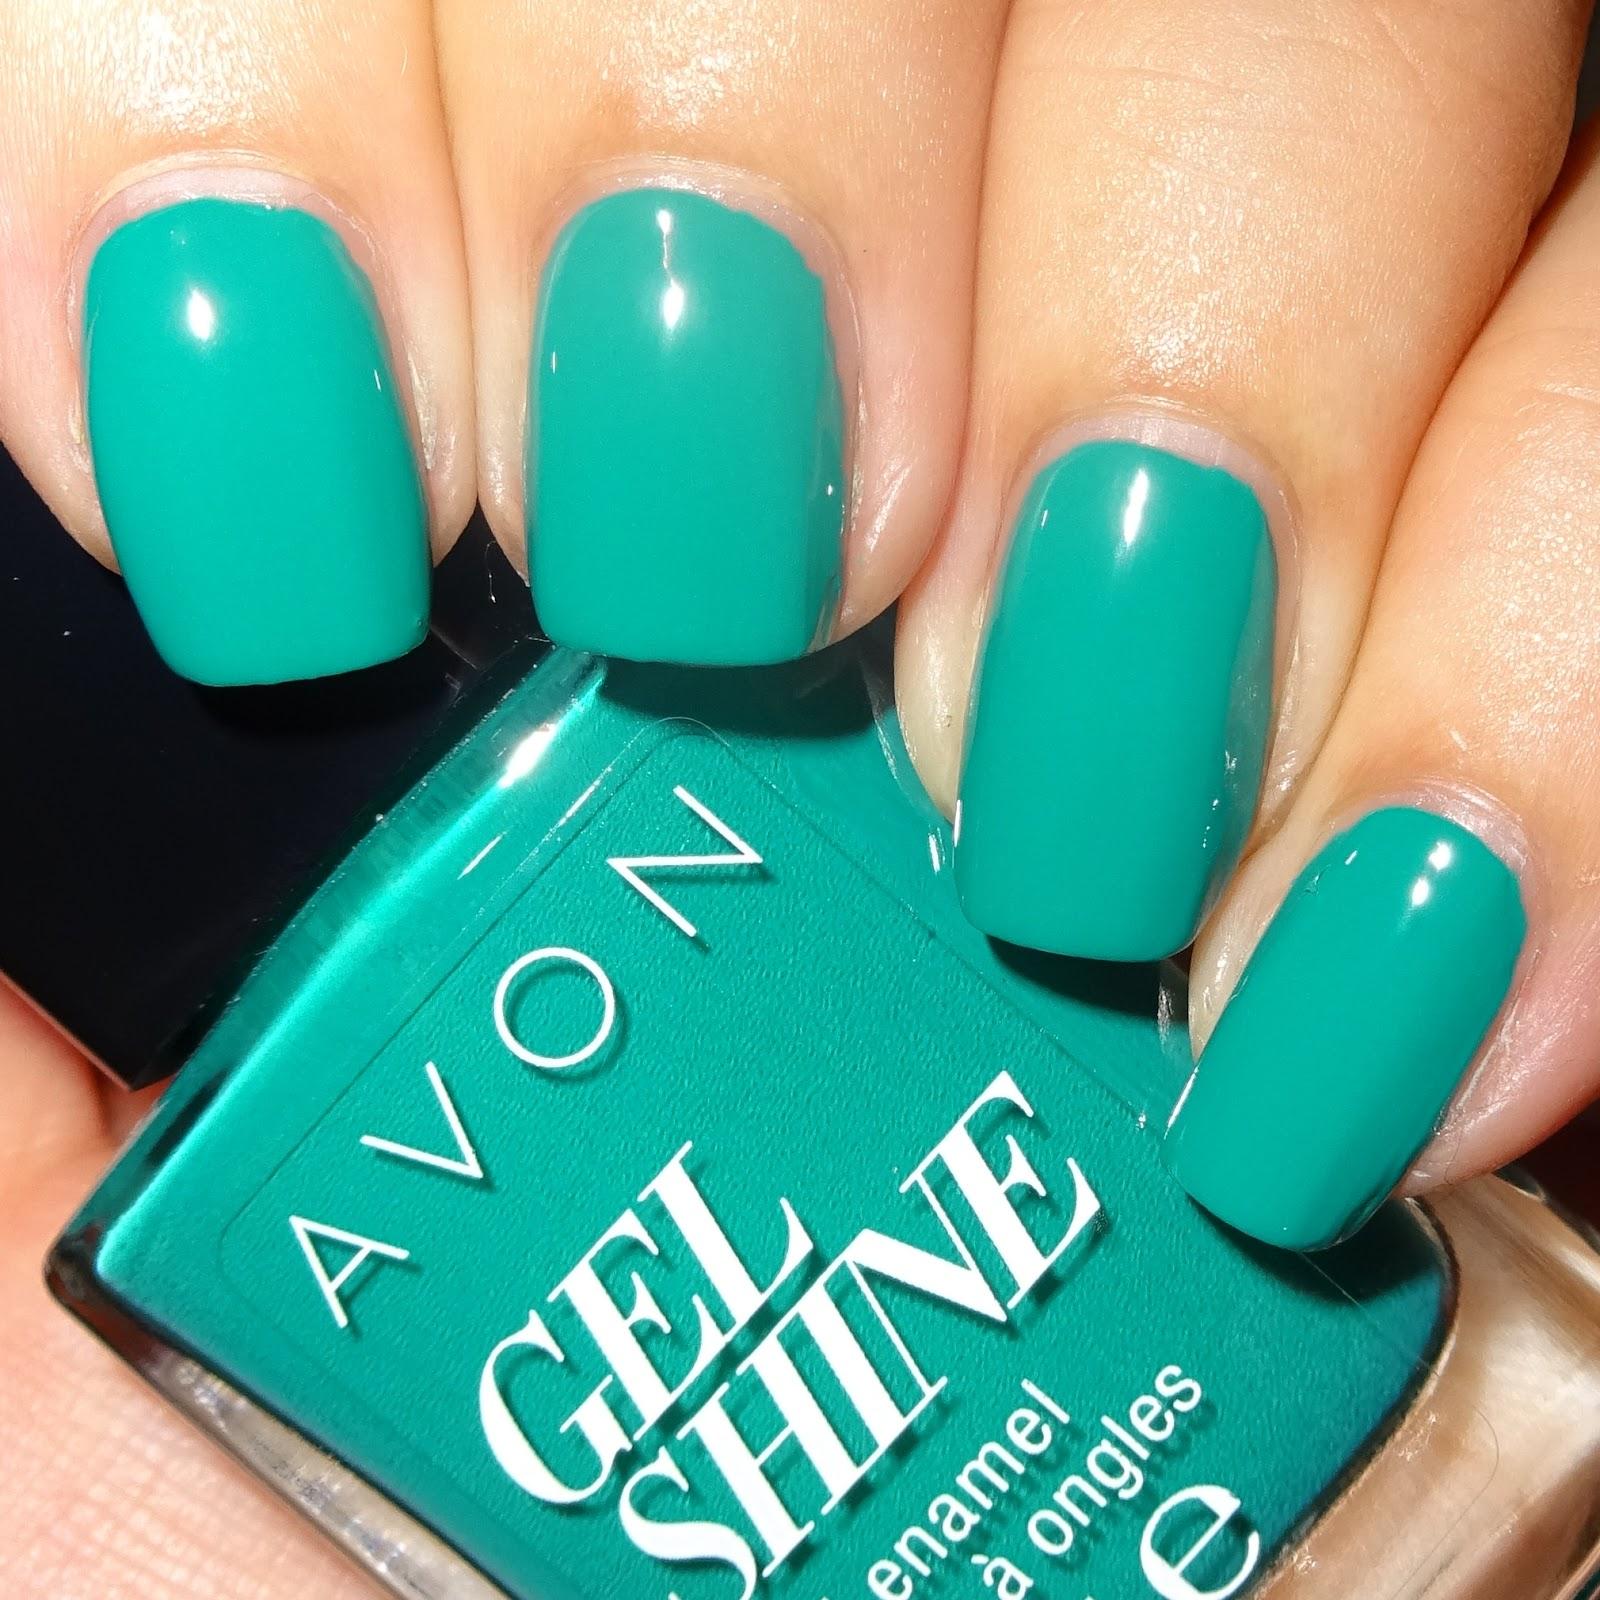 Avon Gel Shine Emerald City